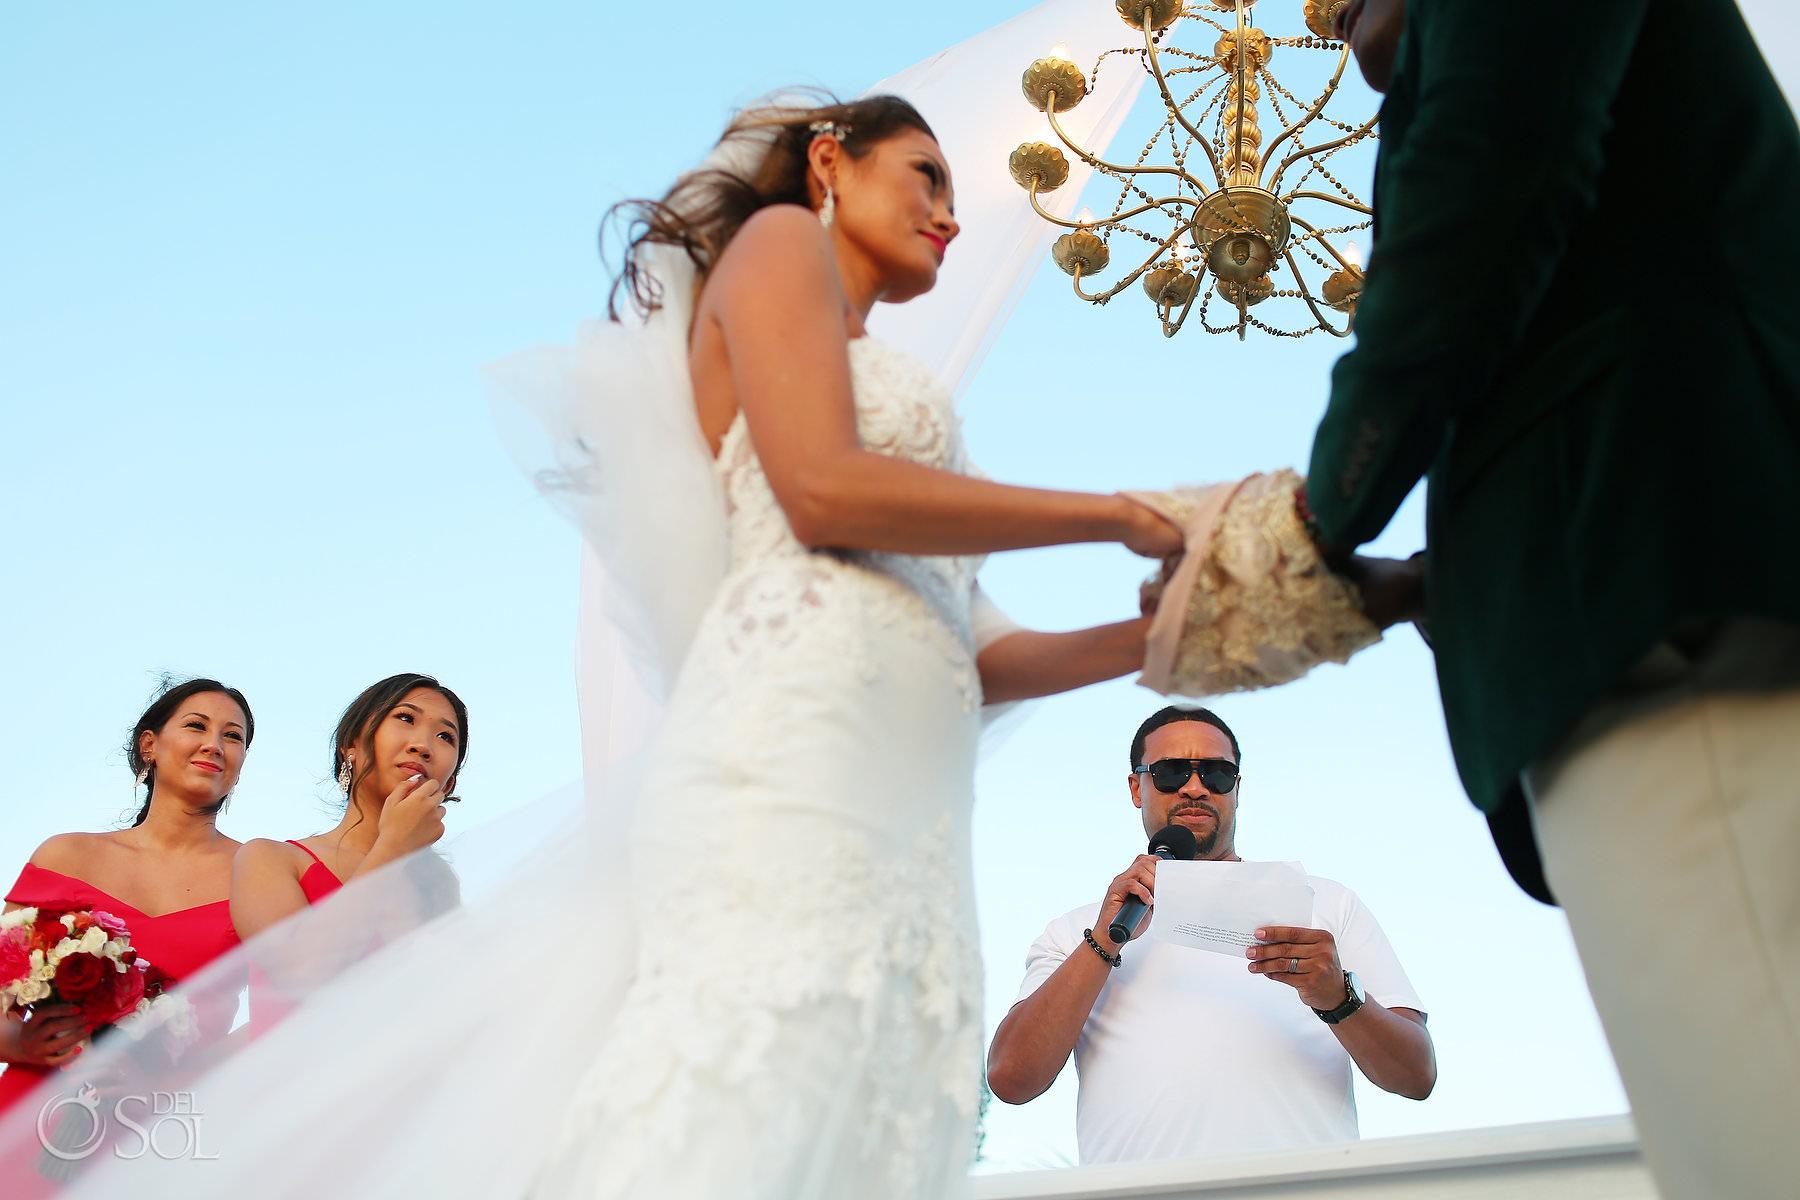 Handfasting unique unity ceremony ideas tie the knot Dreams Riviera cancun Mexico